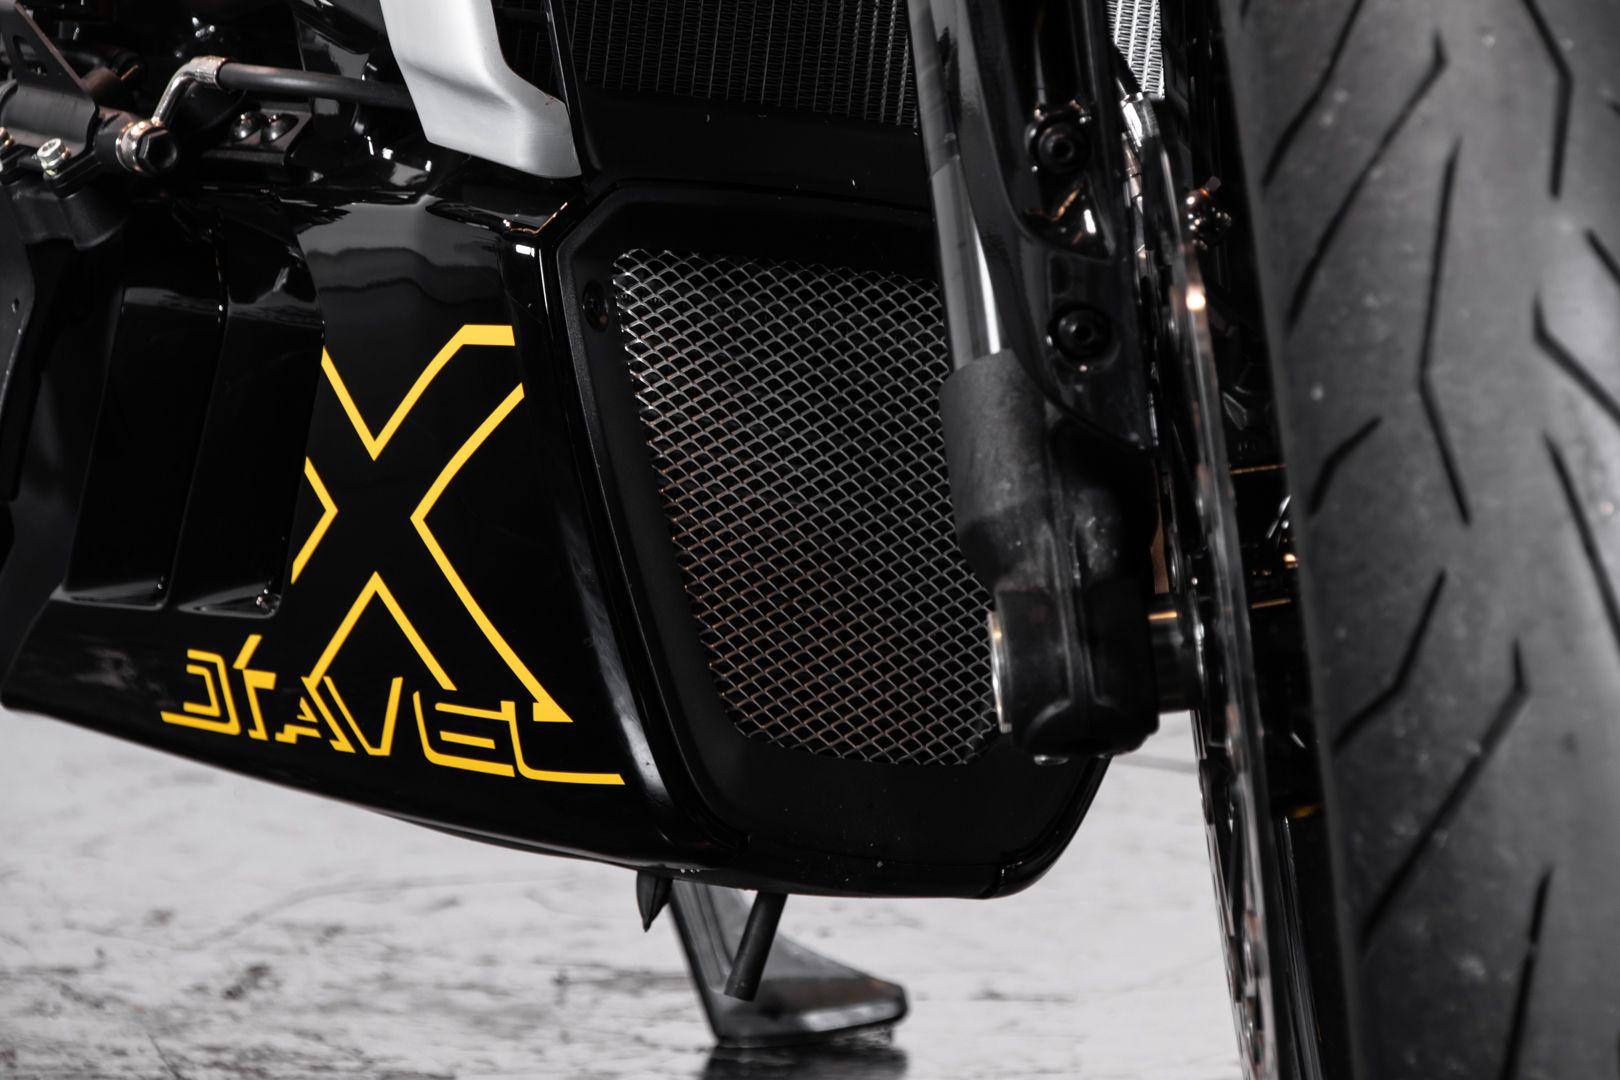 2016 Ducati X Diavel S 72367